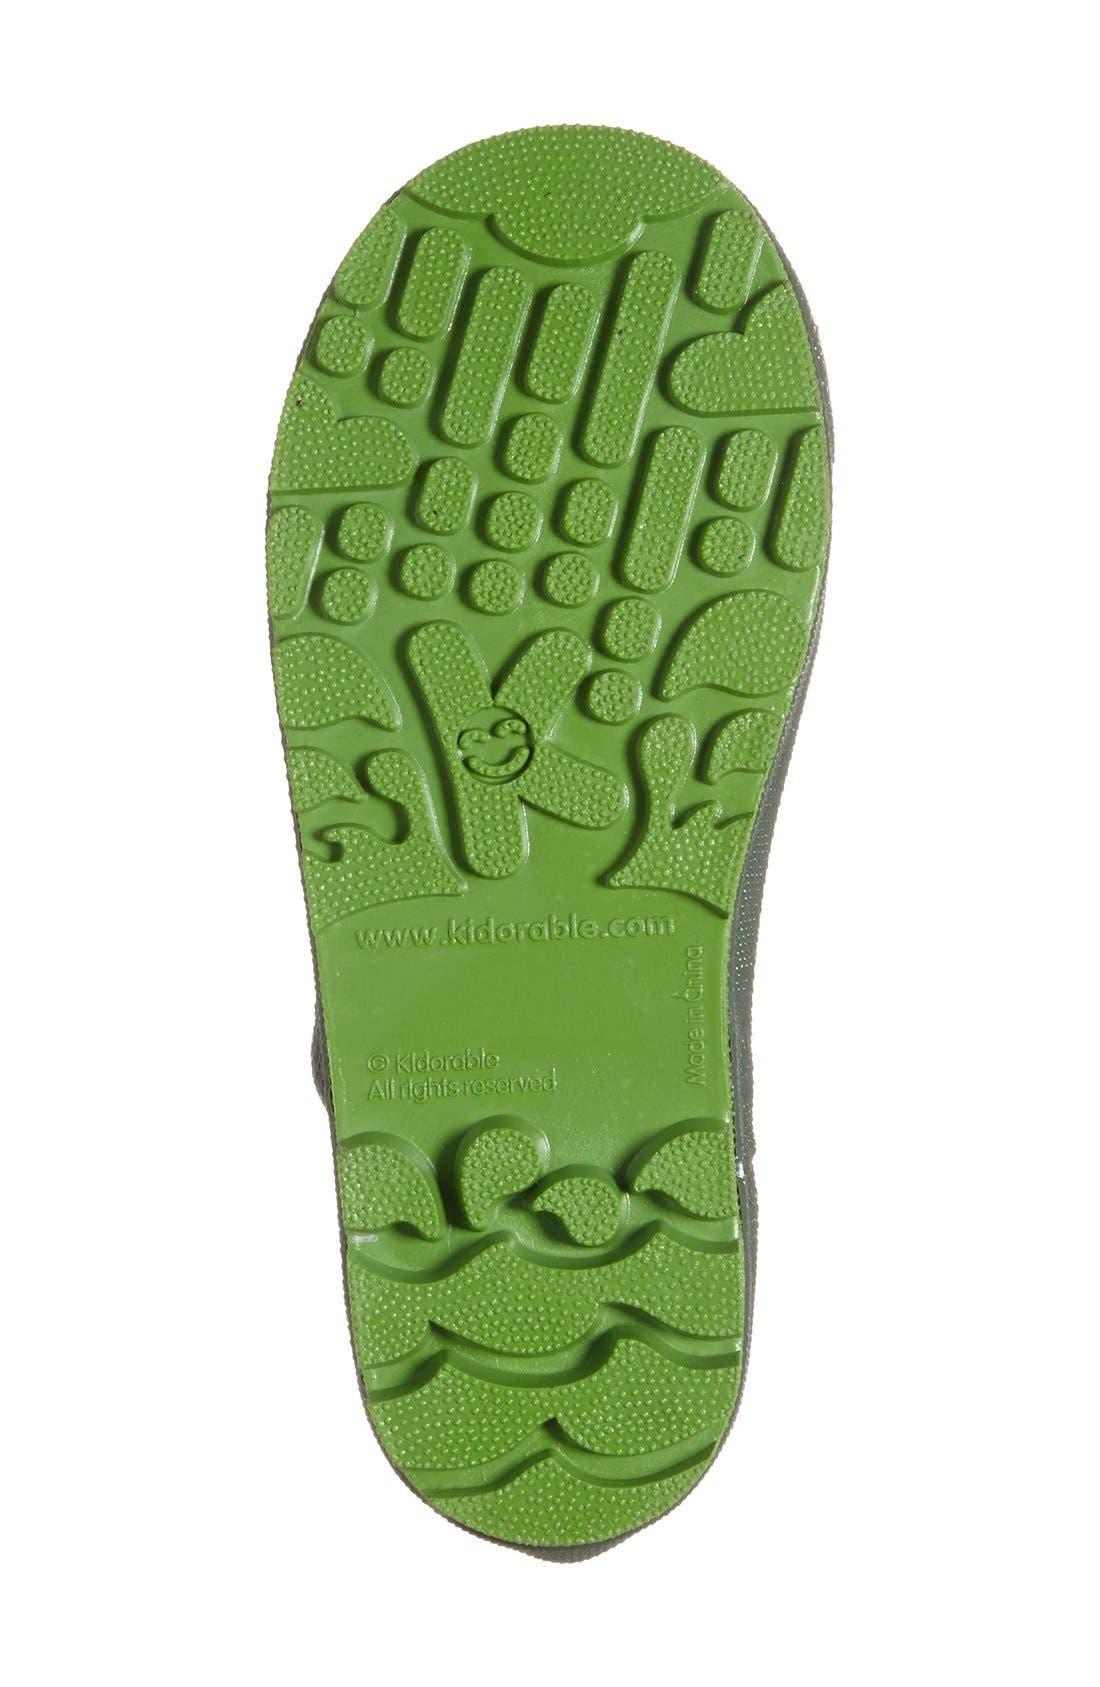 'Frog' Waterproof Rain Boot,                             Alternate thumbnail 4, color,                             Green